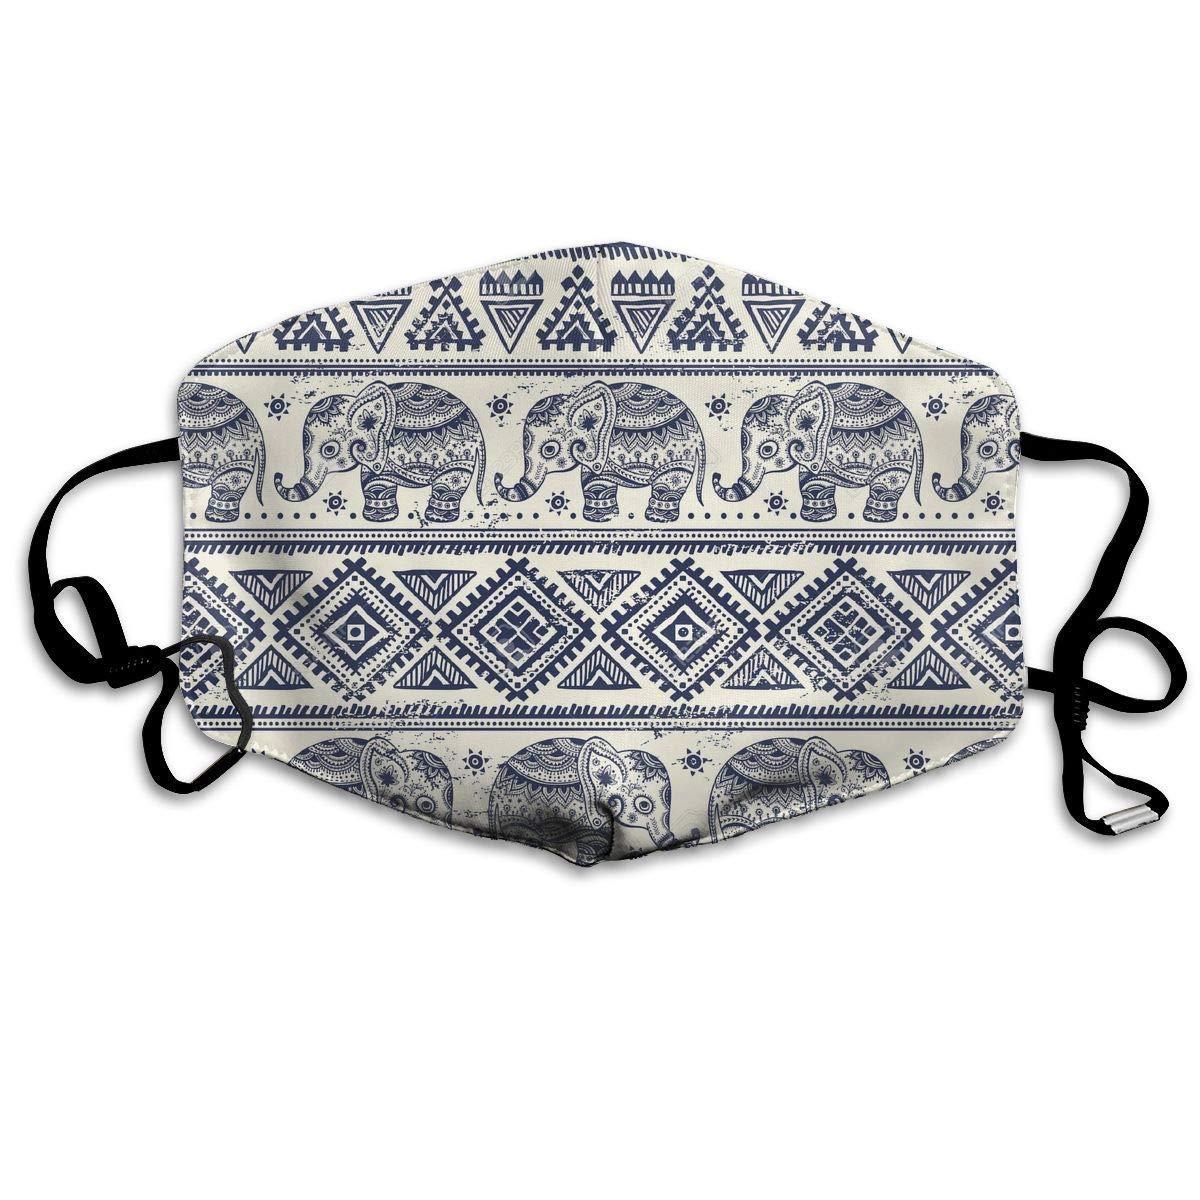 Daawqee Máscara de Boca, Reusable Face Mouth Cover Mask – Warm Reirator Ethnic Elephant Pattern Print Earloop Mask